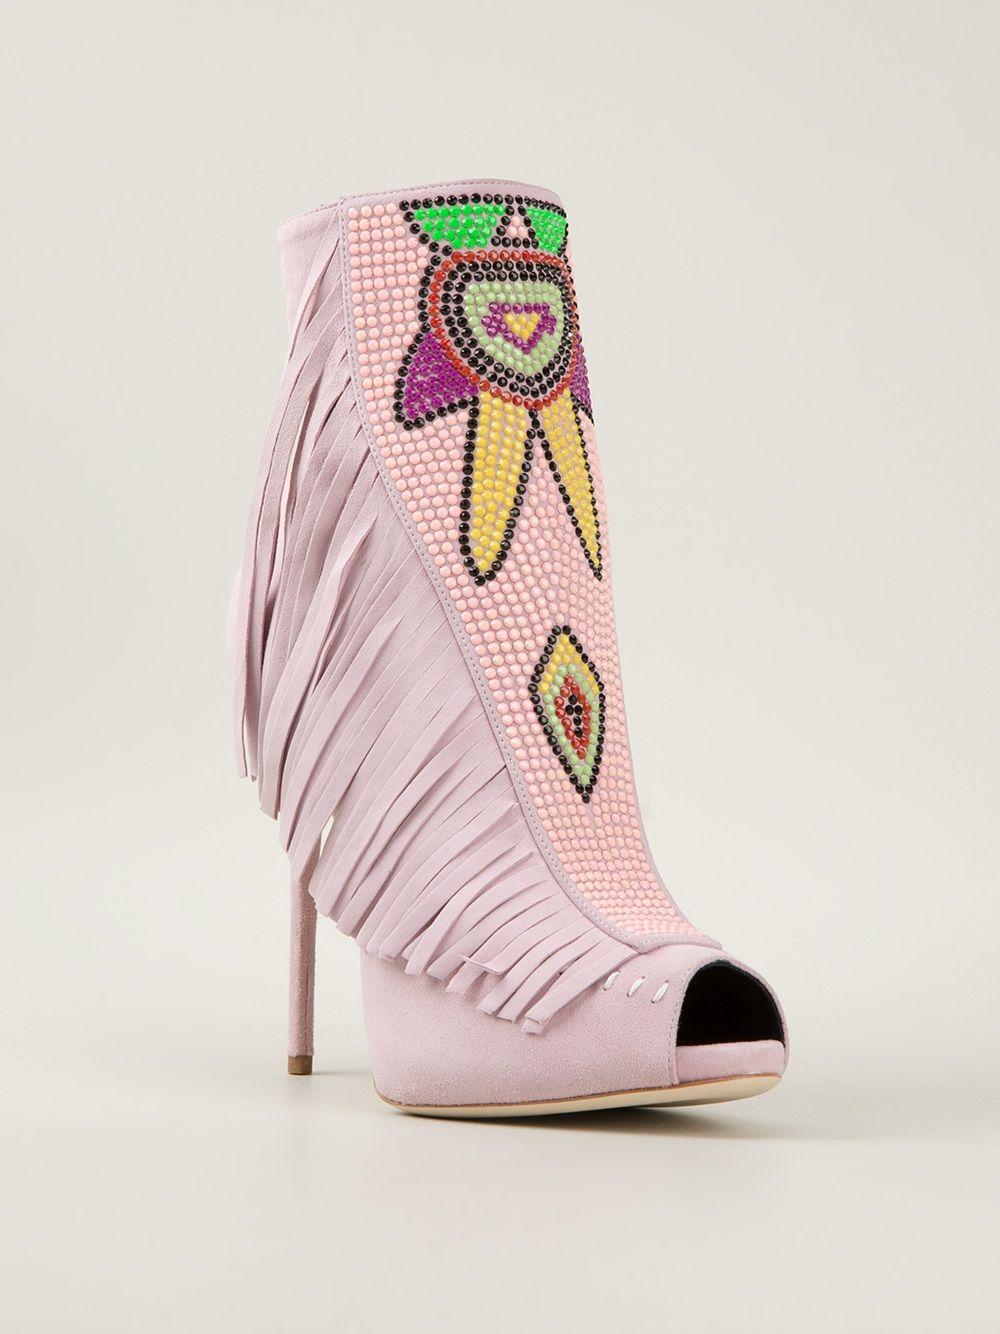 Giuseppe Zanotti Design Fringed Open Toe Ankle Boots - Julian Fashion - Farfetch.com.br